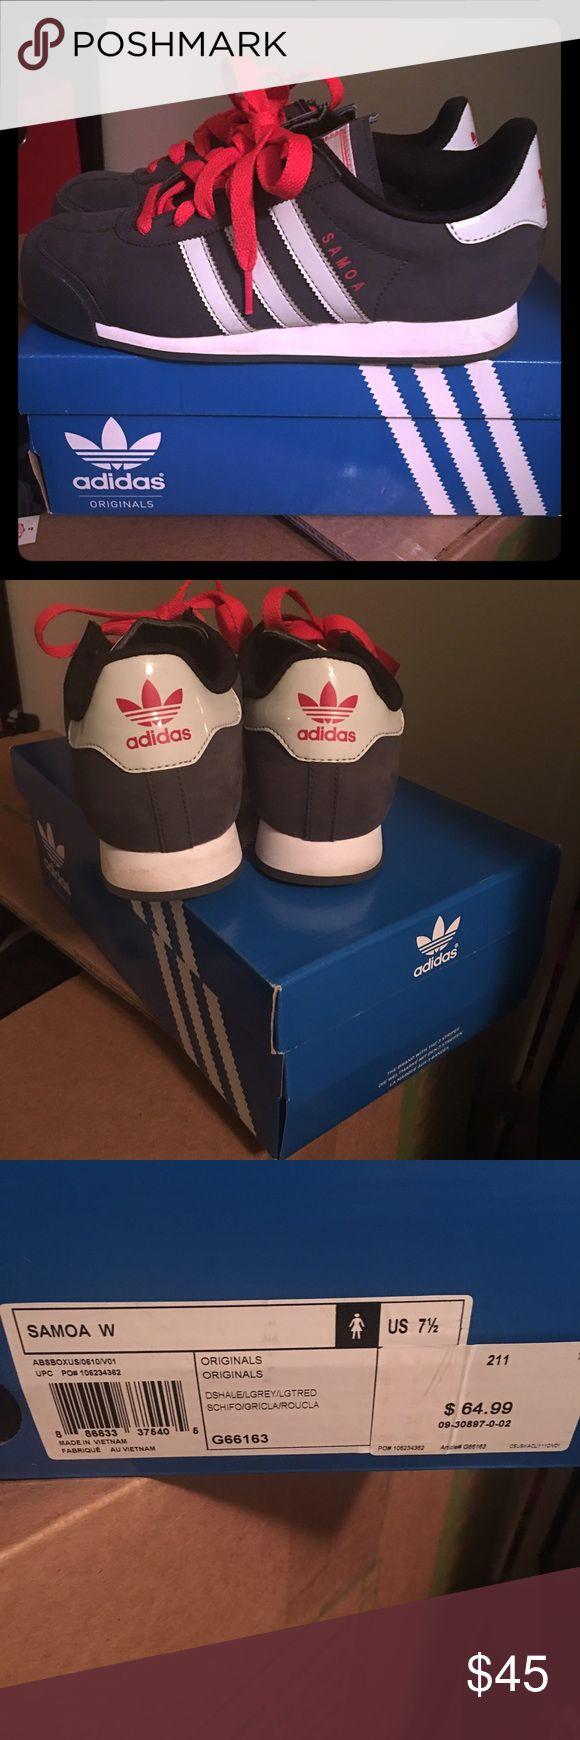 Adidas somas Worn 3 times Adidas Shoes Athletic Shoes